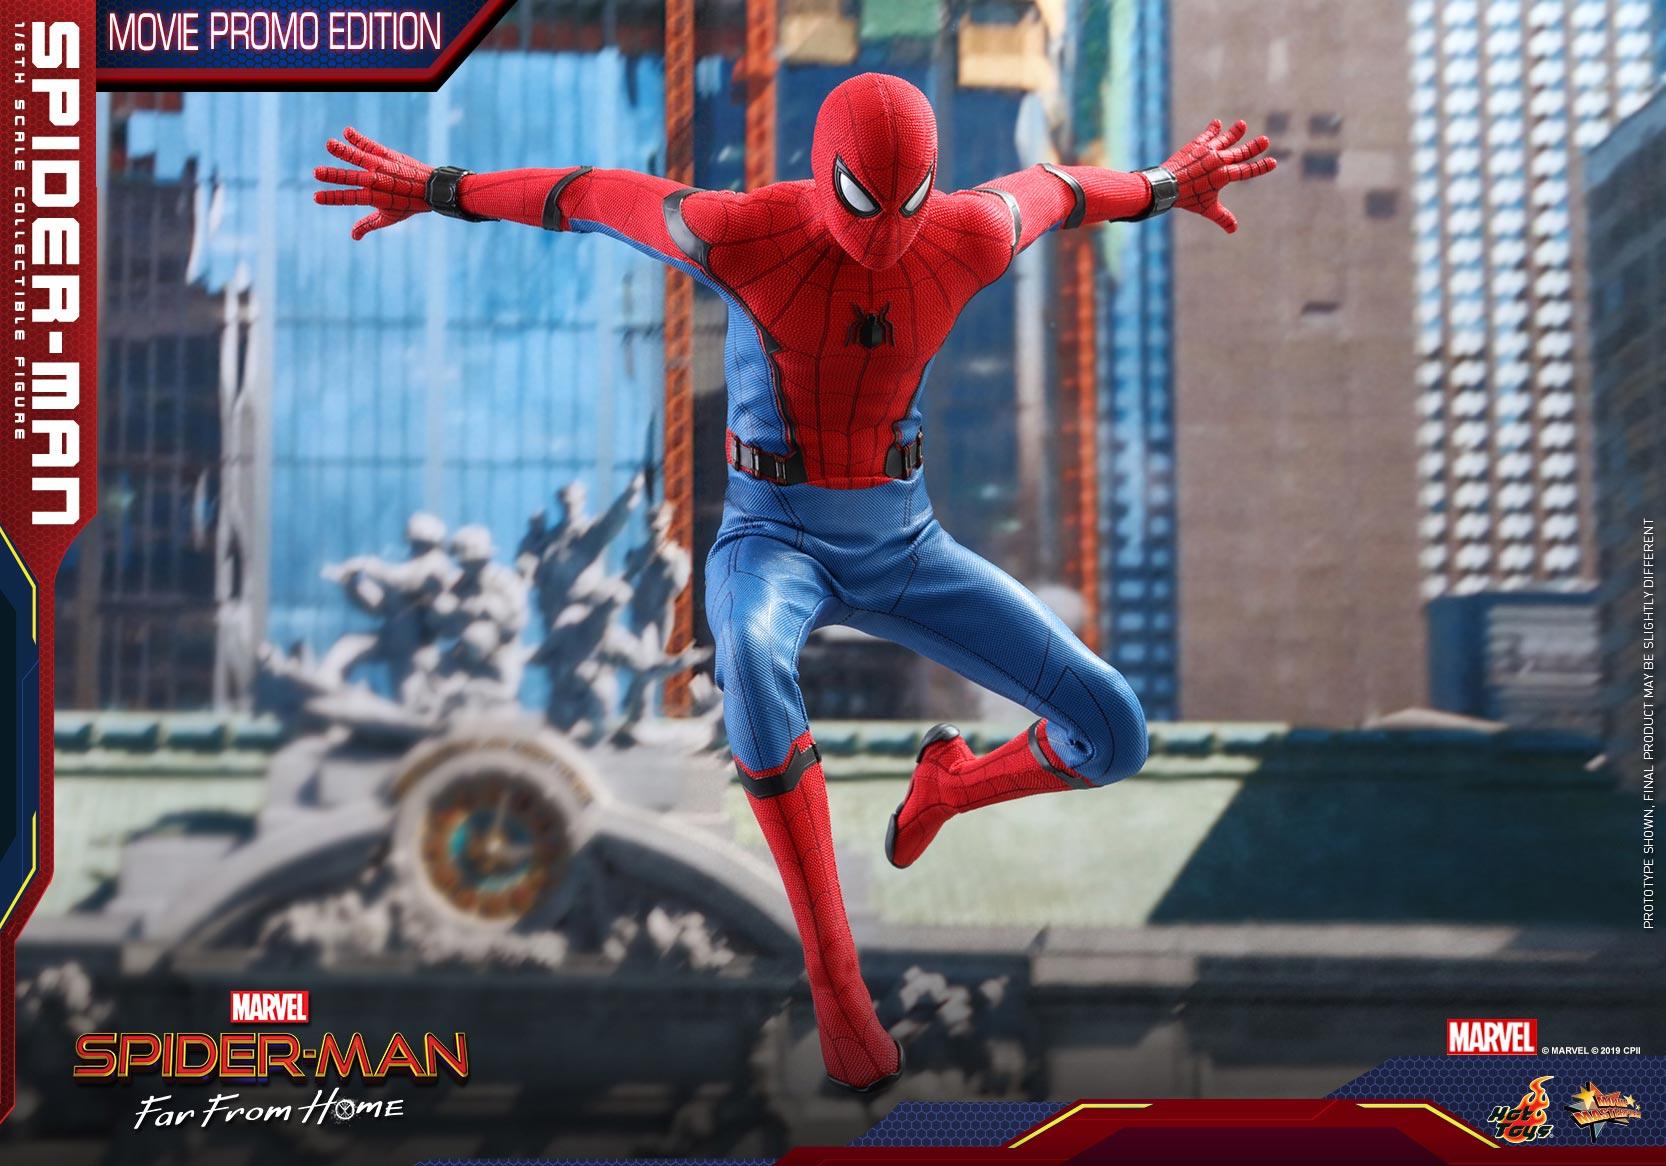 Hot-Toys---SMFFH---Spider-Man-(Movie-Promo-Edition)-collectible-figure_PR12